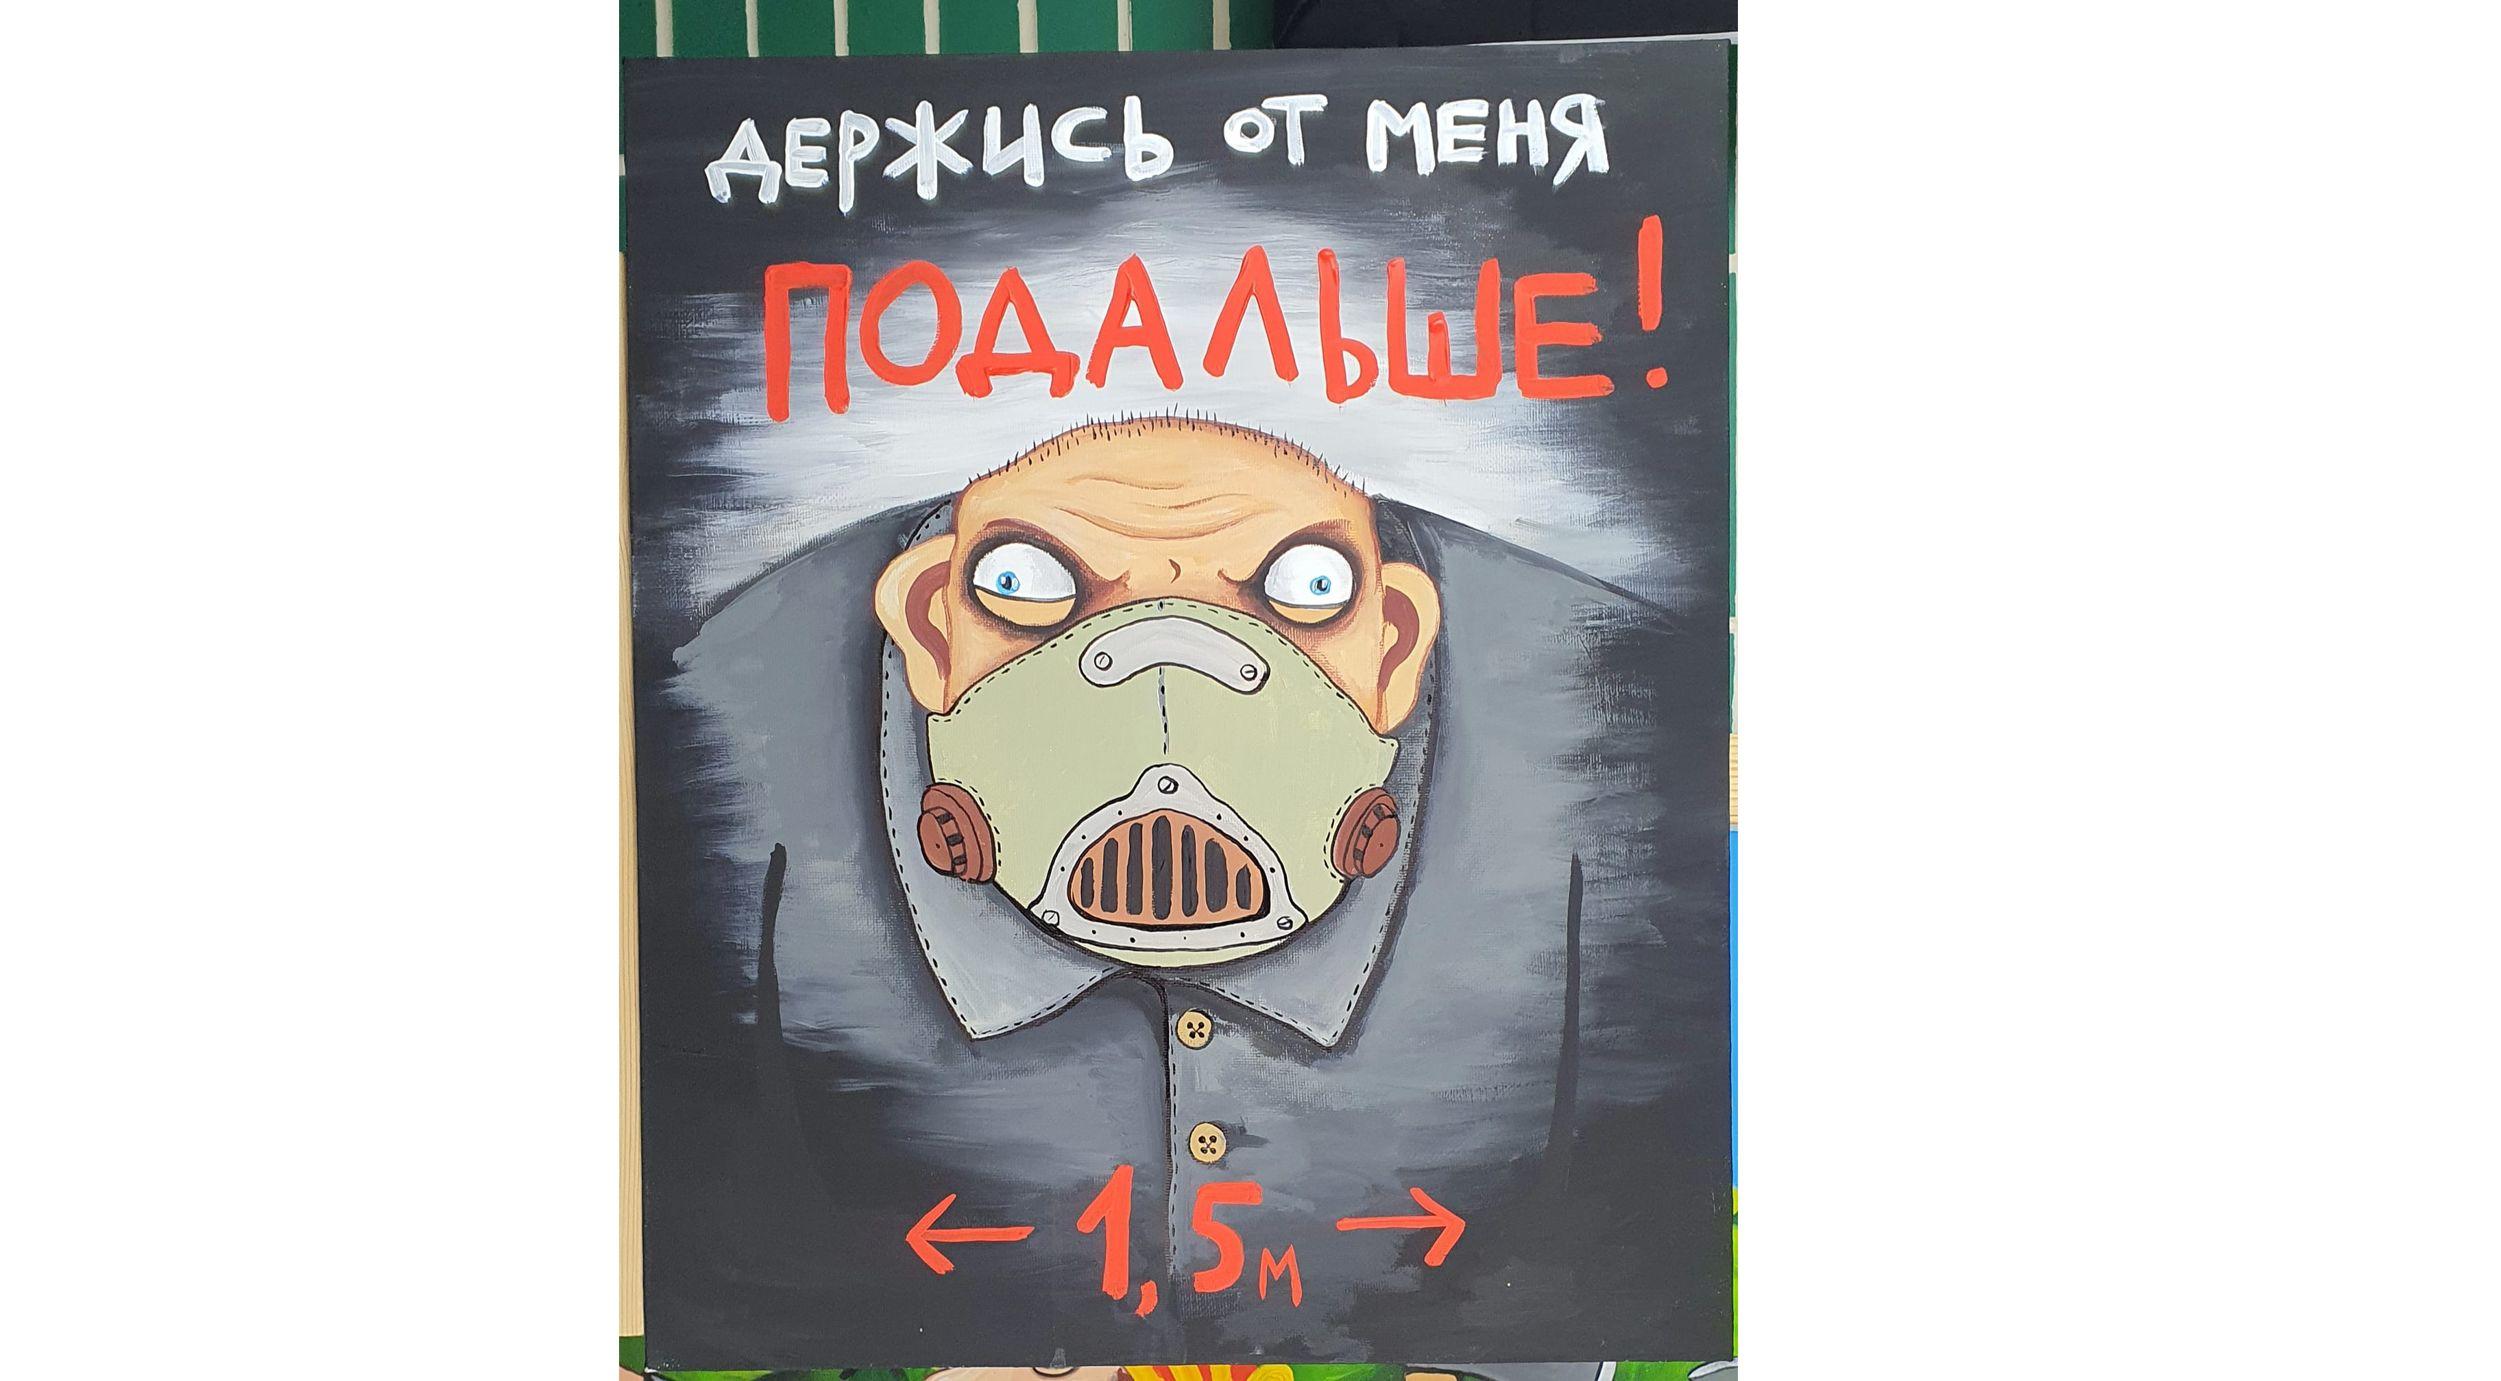 Вася Ложкин нарисовал «дистанционную» картину-напоминалку о коронавирусе